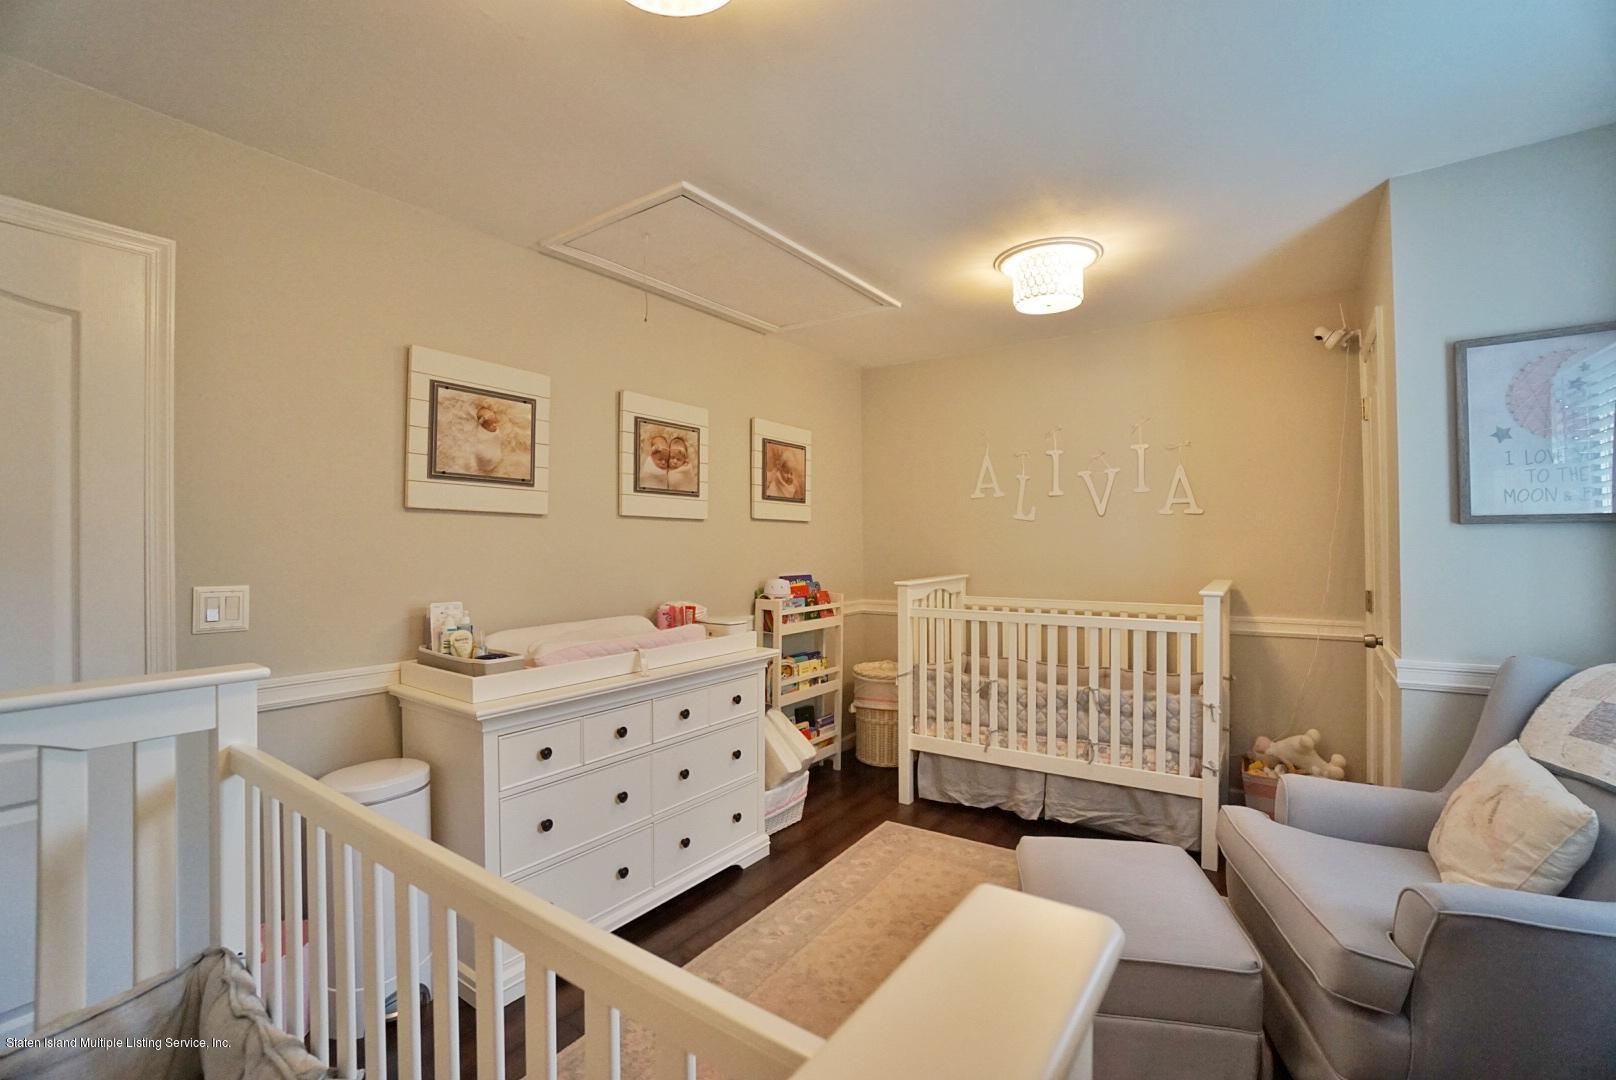 Single Family - Semi-Attached 66 Reading Avenue  Staten Island, NY 10312, MLS-1132256-14